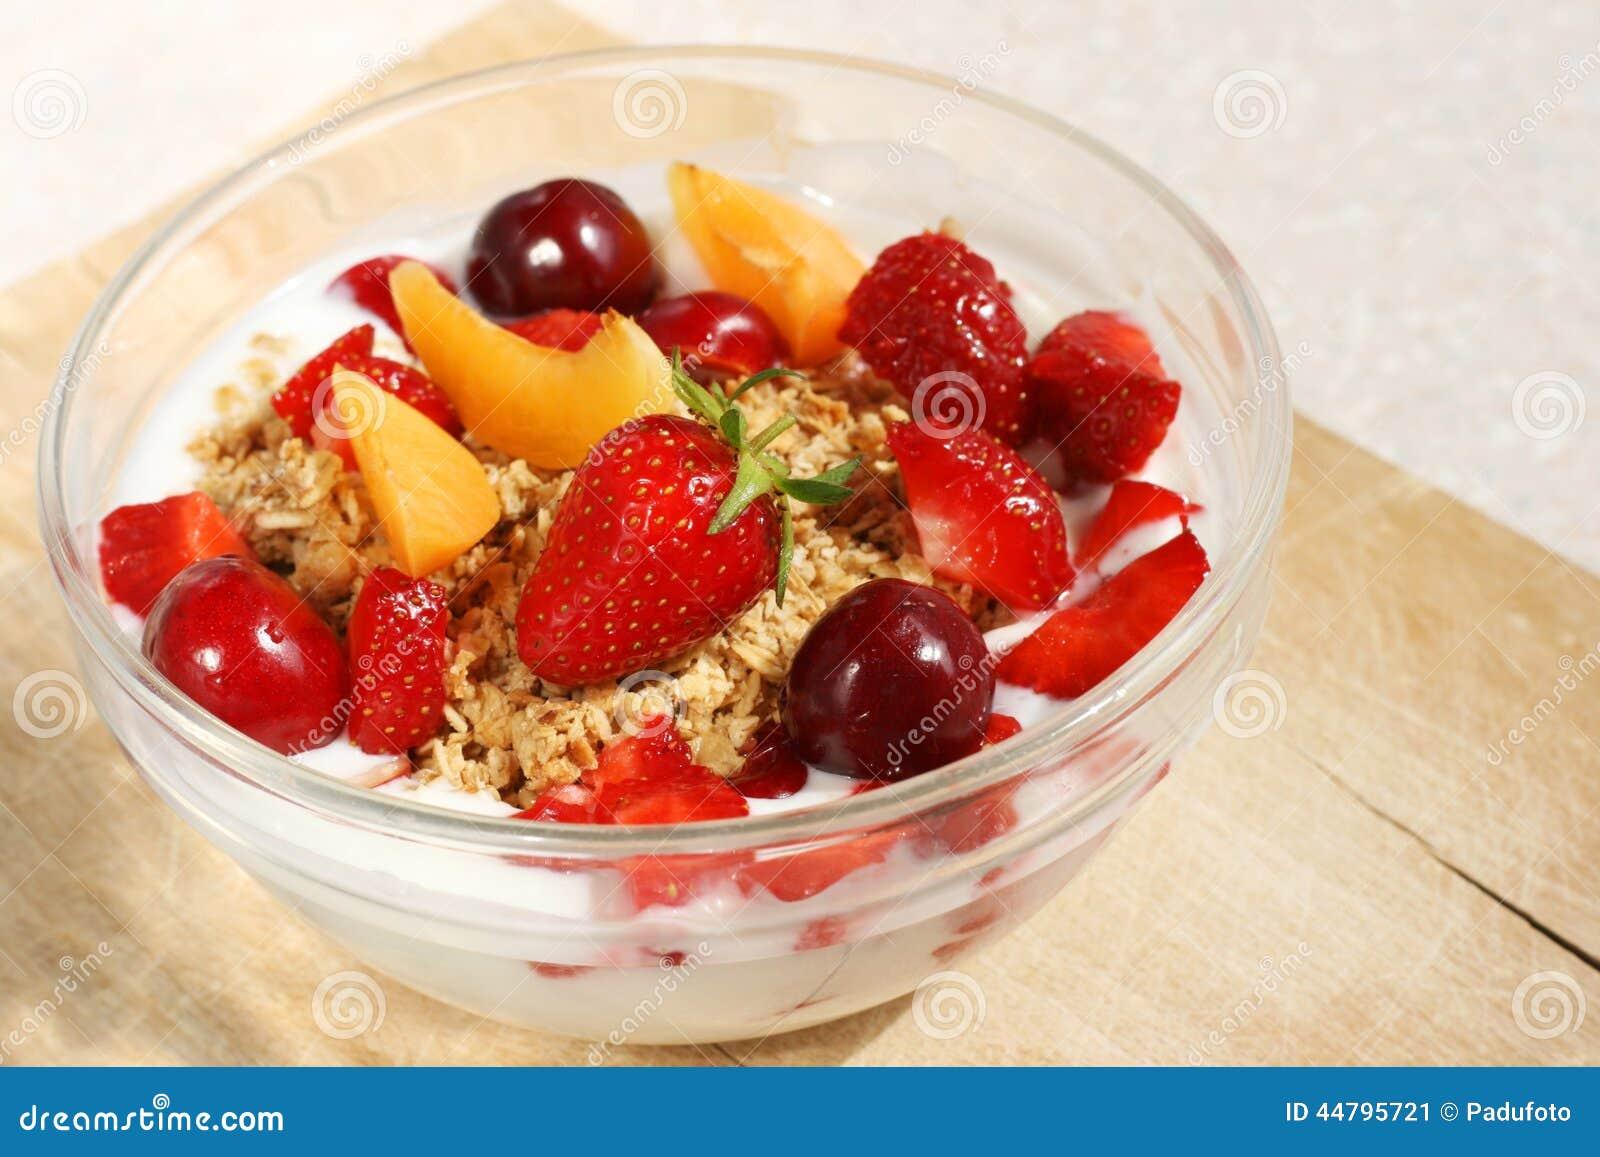 Crunchy Fruit Muesli (whole Grain Oats) Stock Photo ...